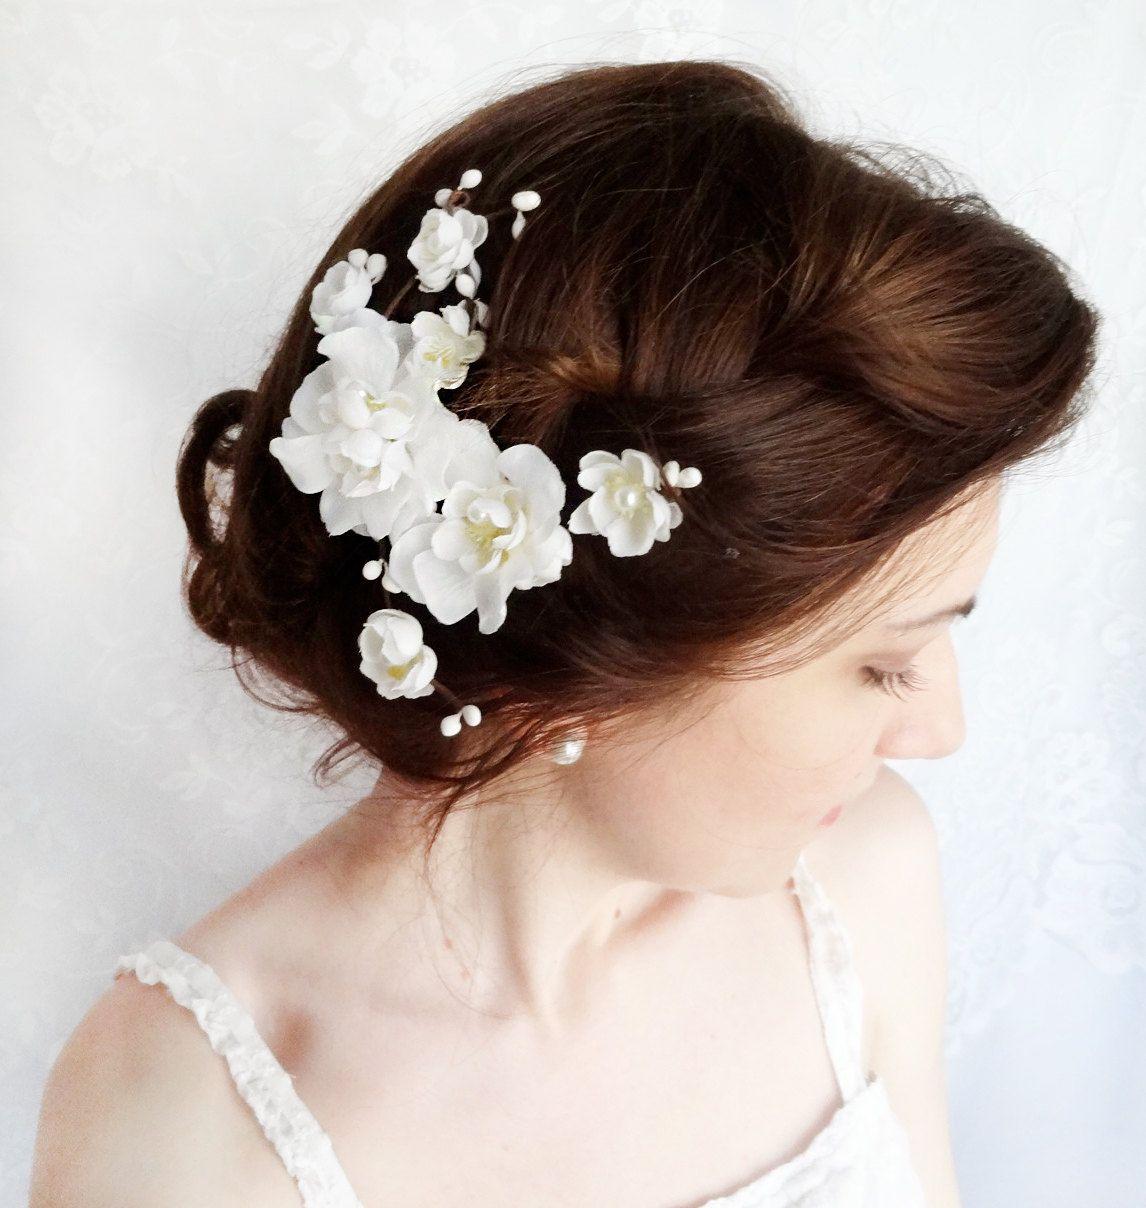 white flower for hair, bridal hair accessories, rustic